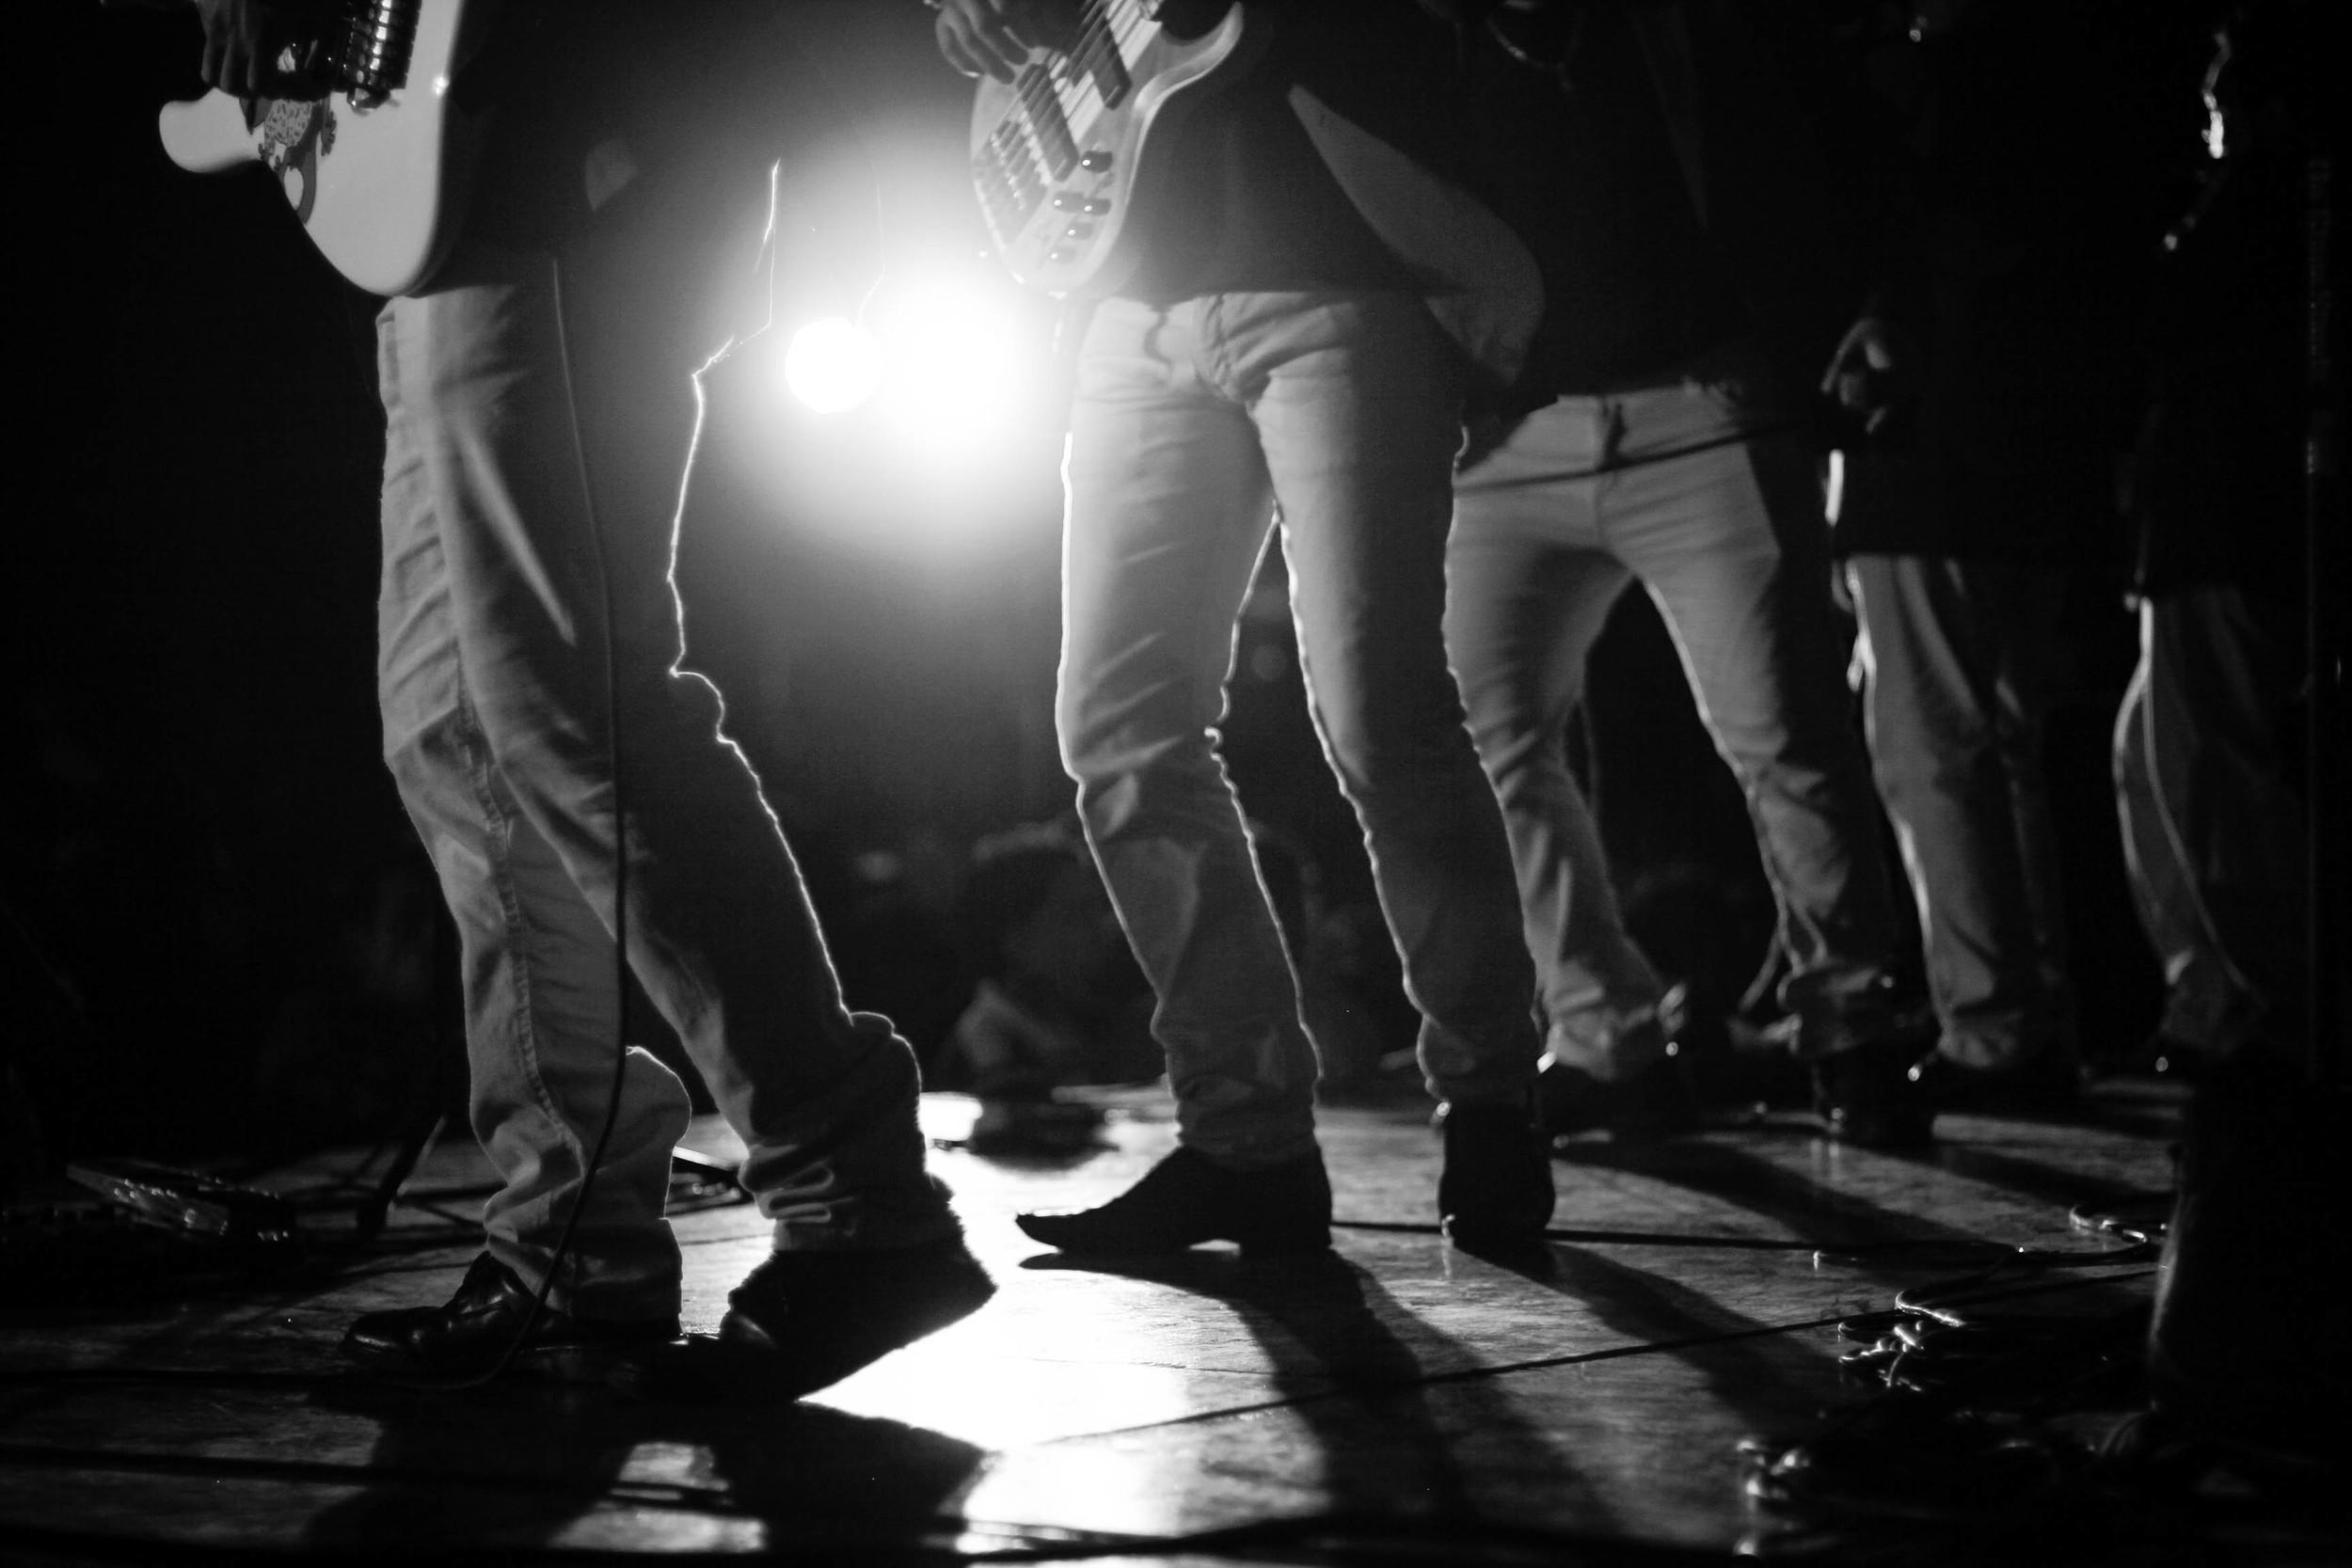 merida dancing black and white